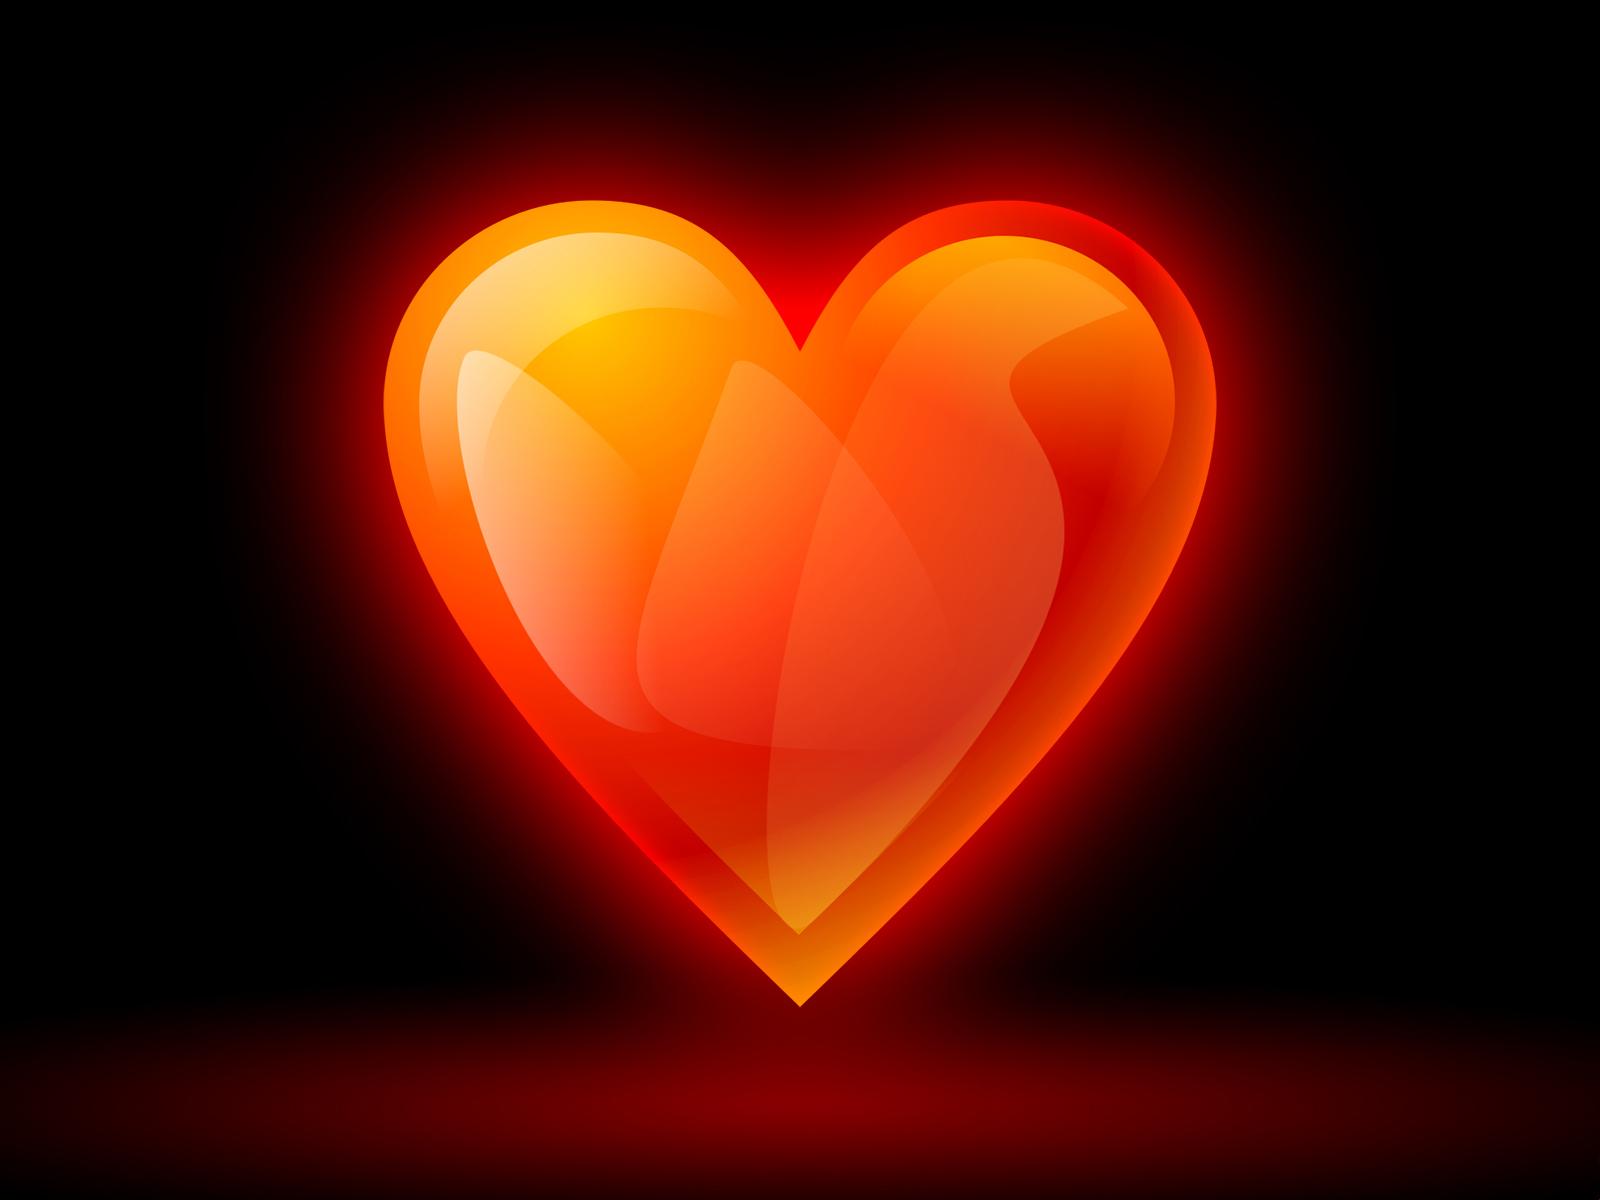 Love Heart Pictures Wallpaper:Computer Wallpaper | Free Wallpaper Downloads